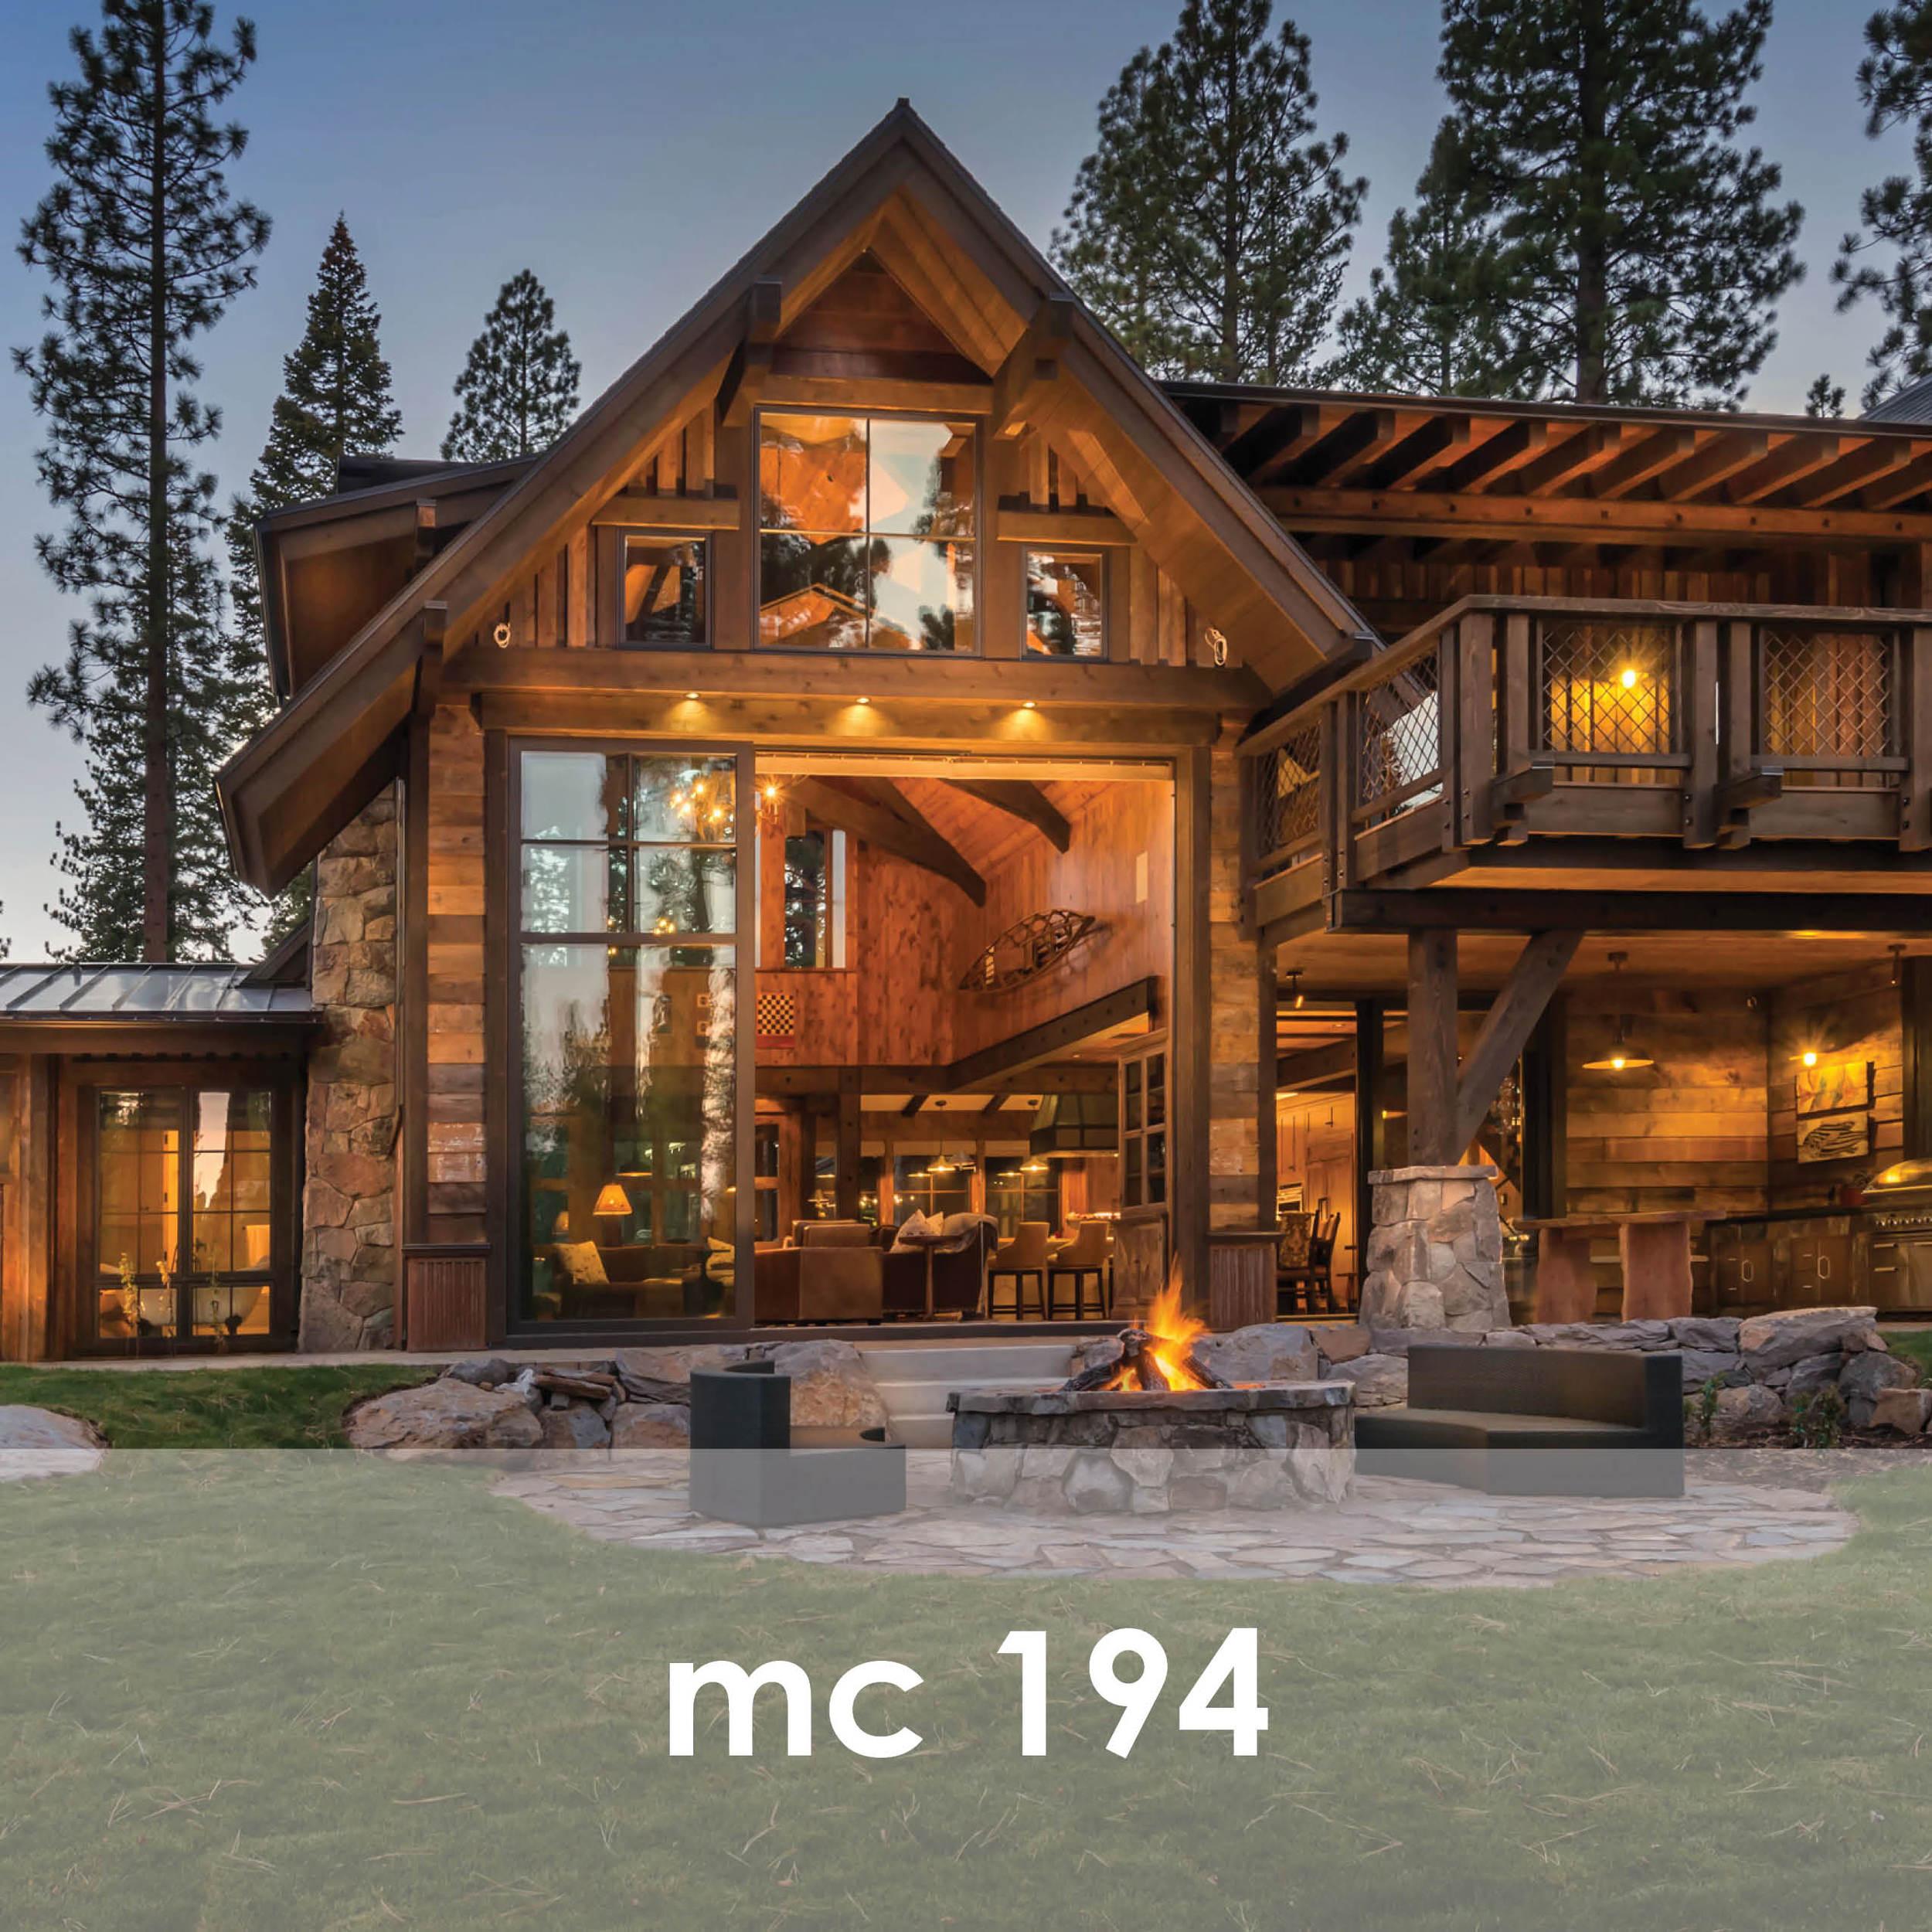 mc-194.jpg